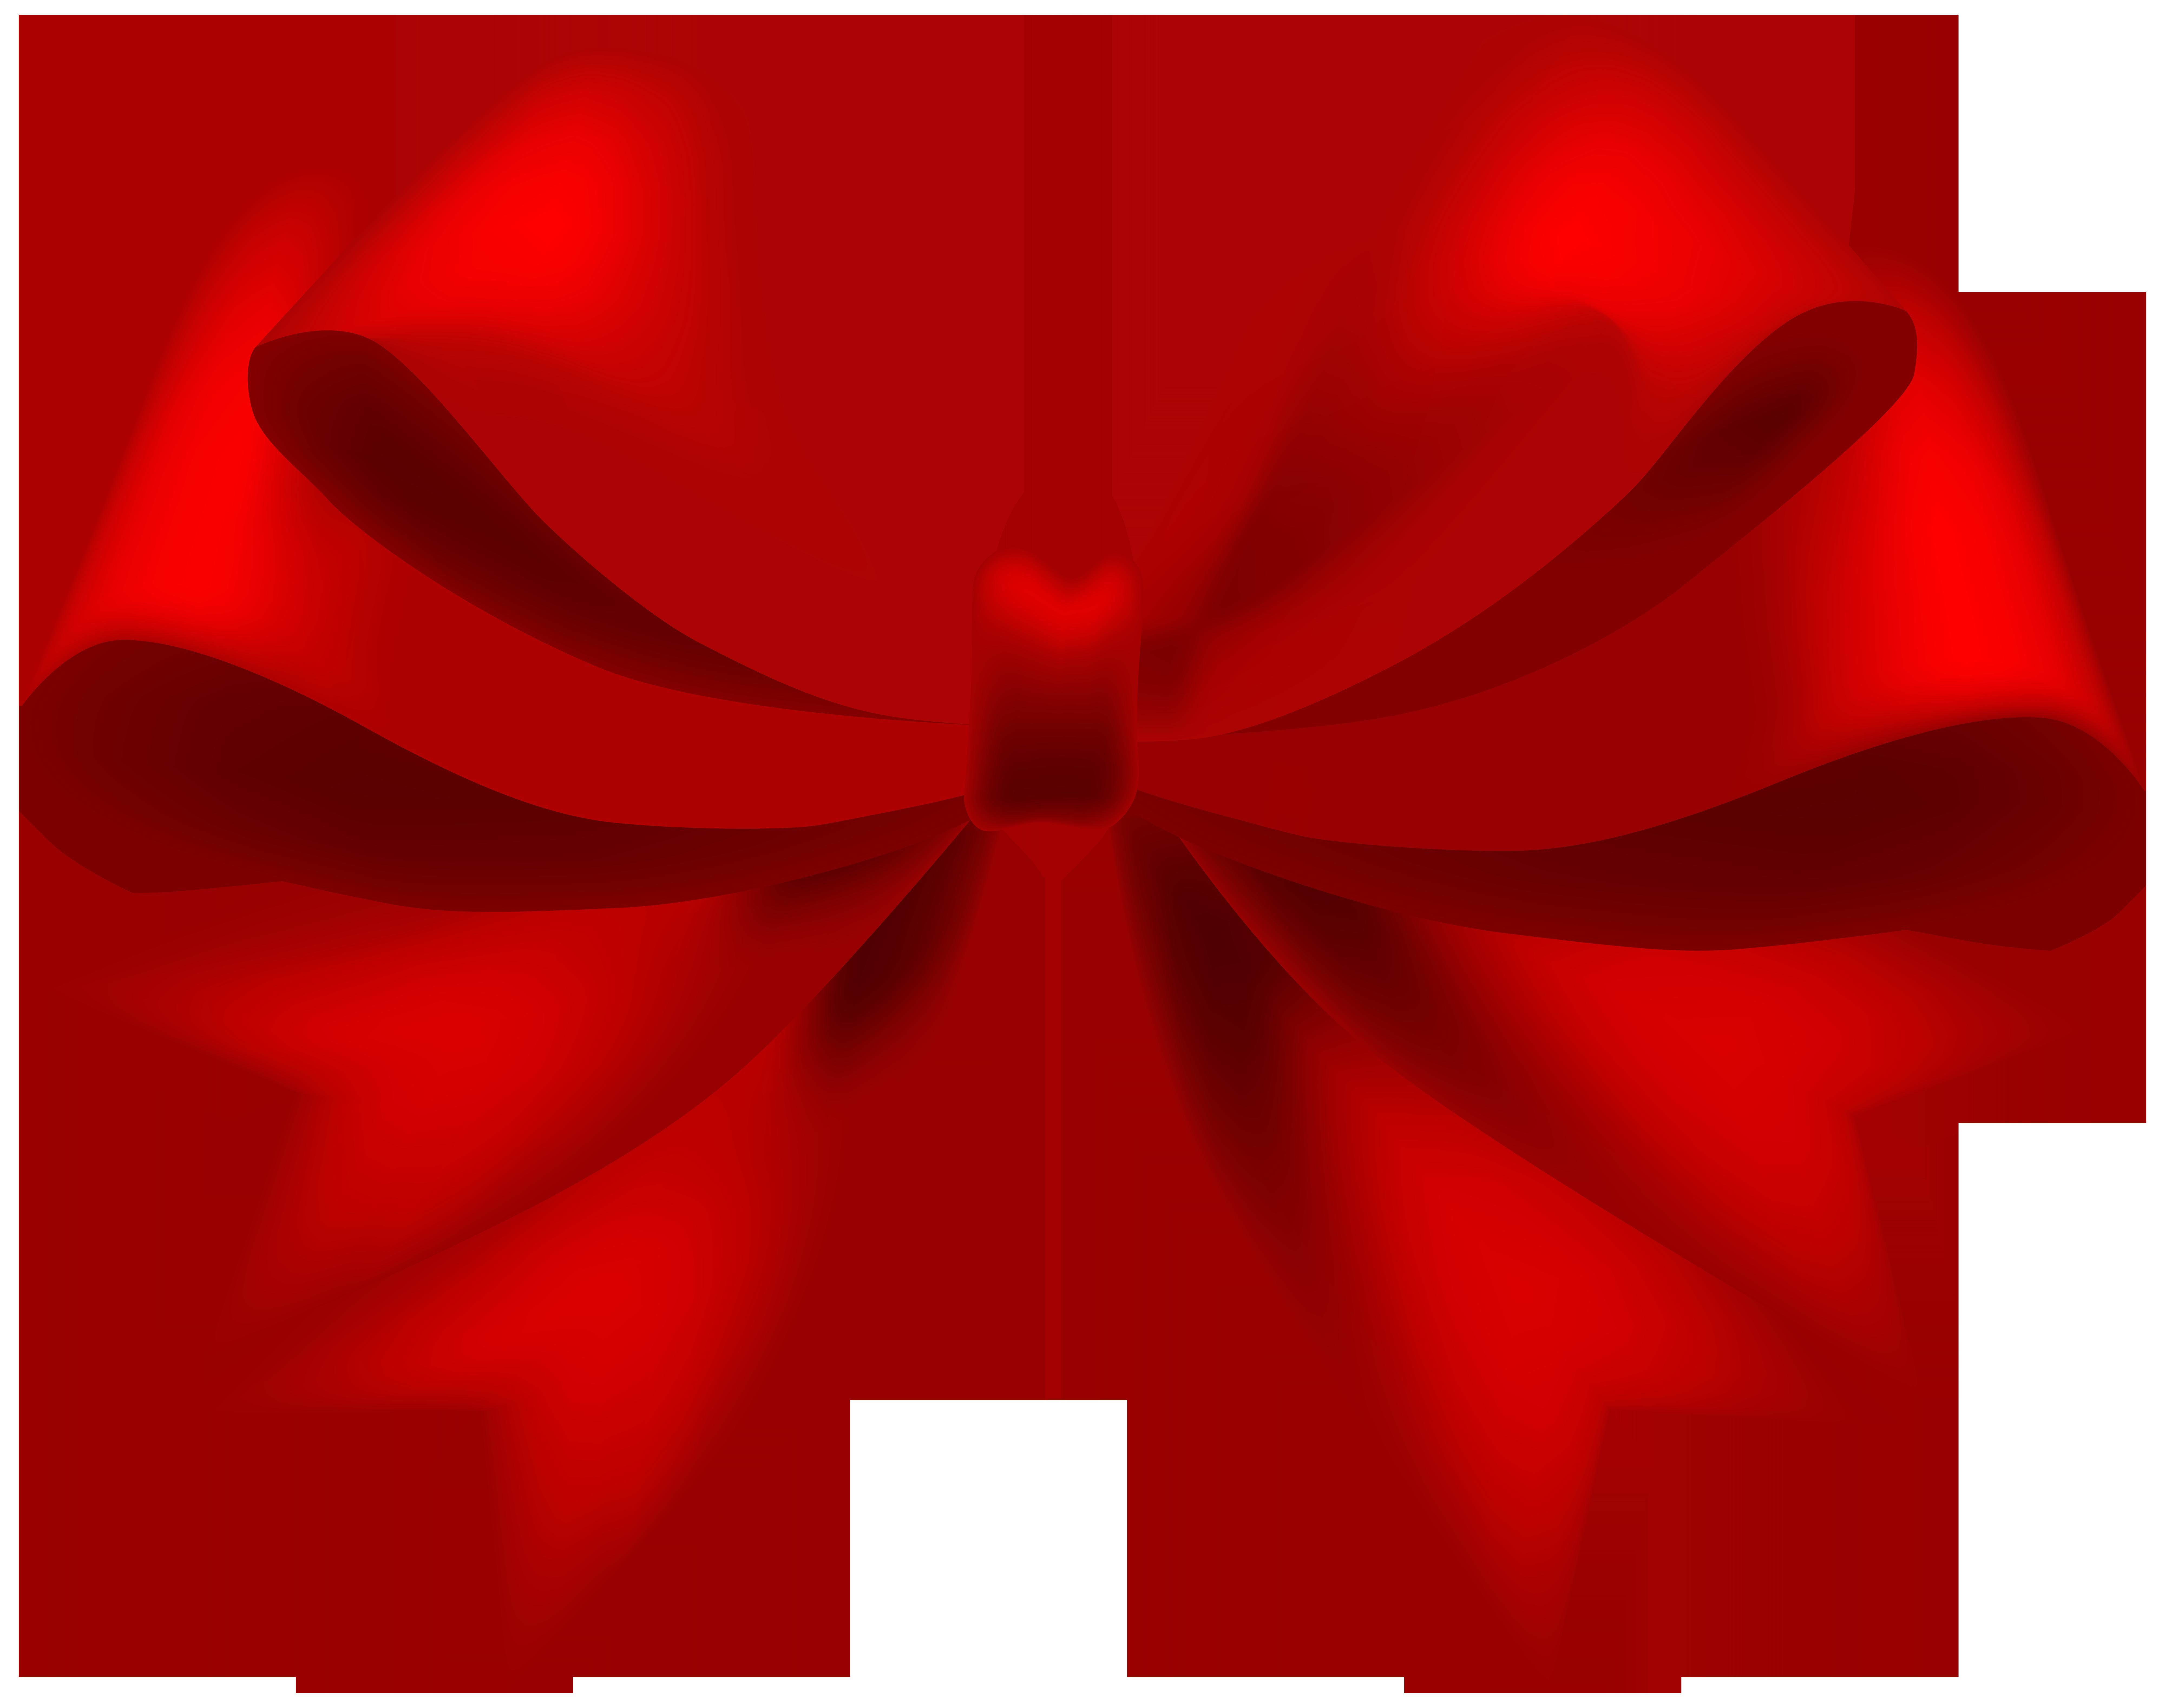 Lem /. L. reccomend Red Bow